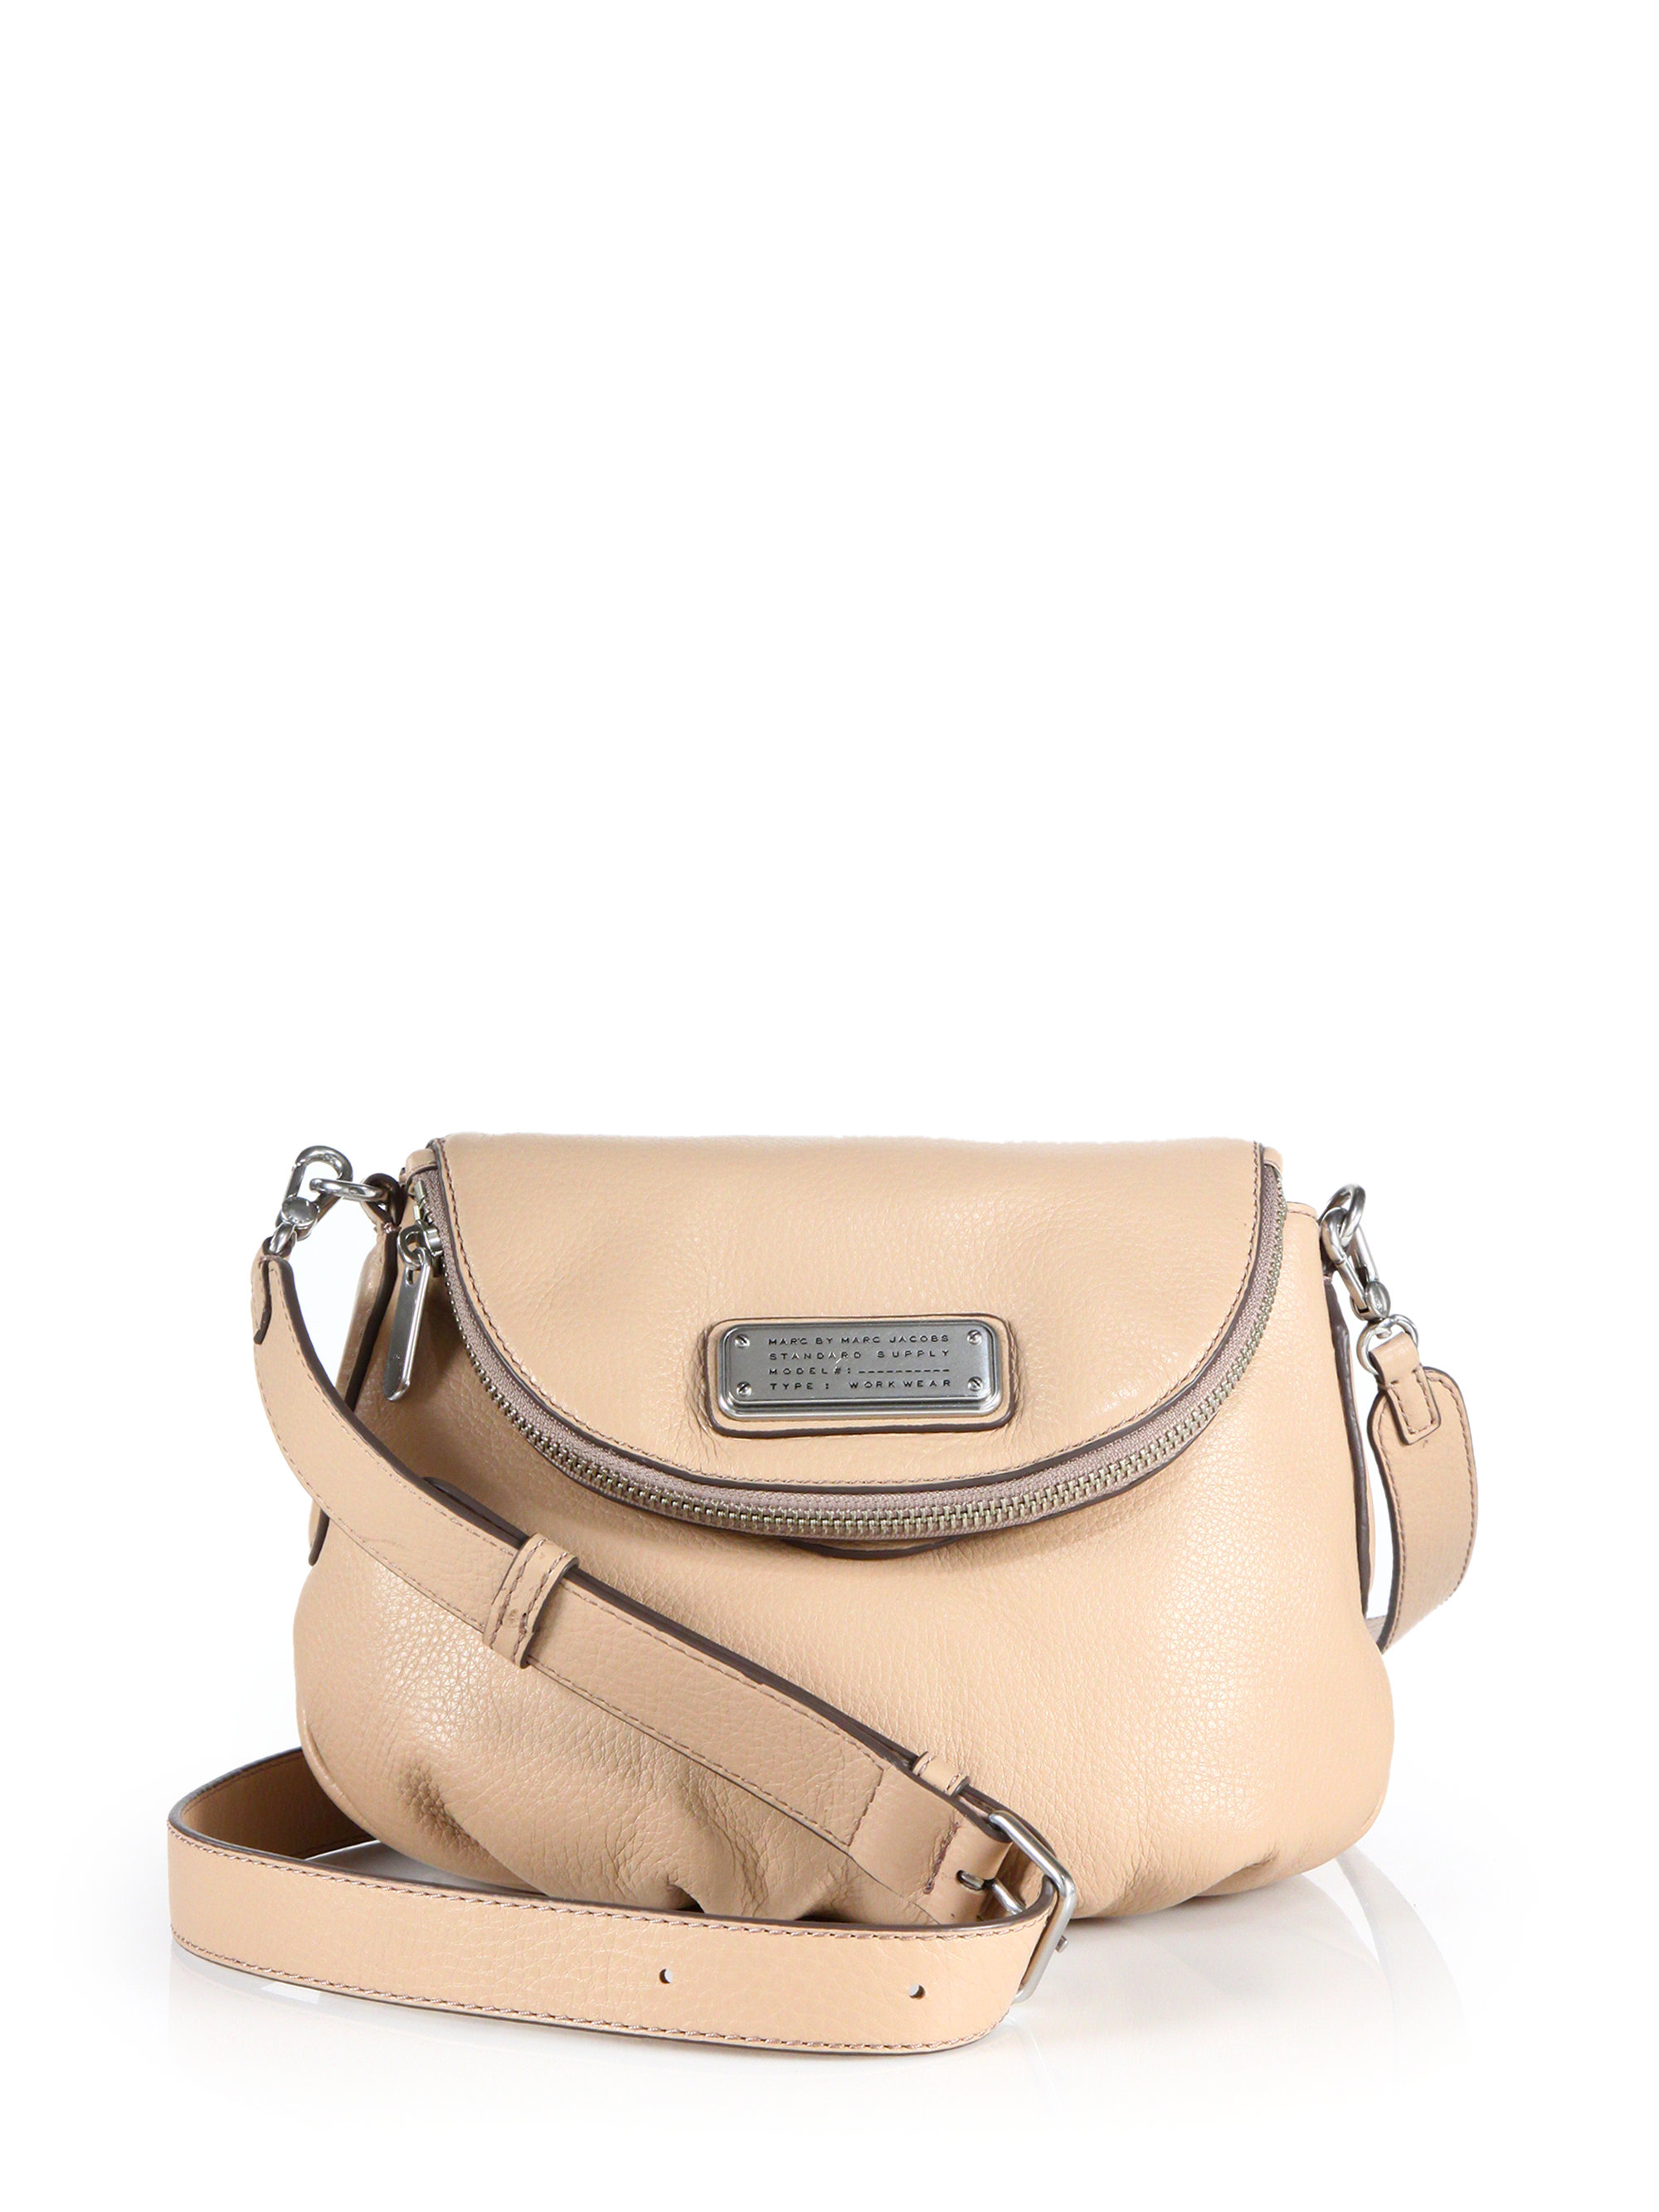 e749d2f5c6 Lyst - Marc By Marc Jacobs Mini Natasha Crossbody Bag in Natural